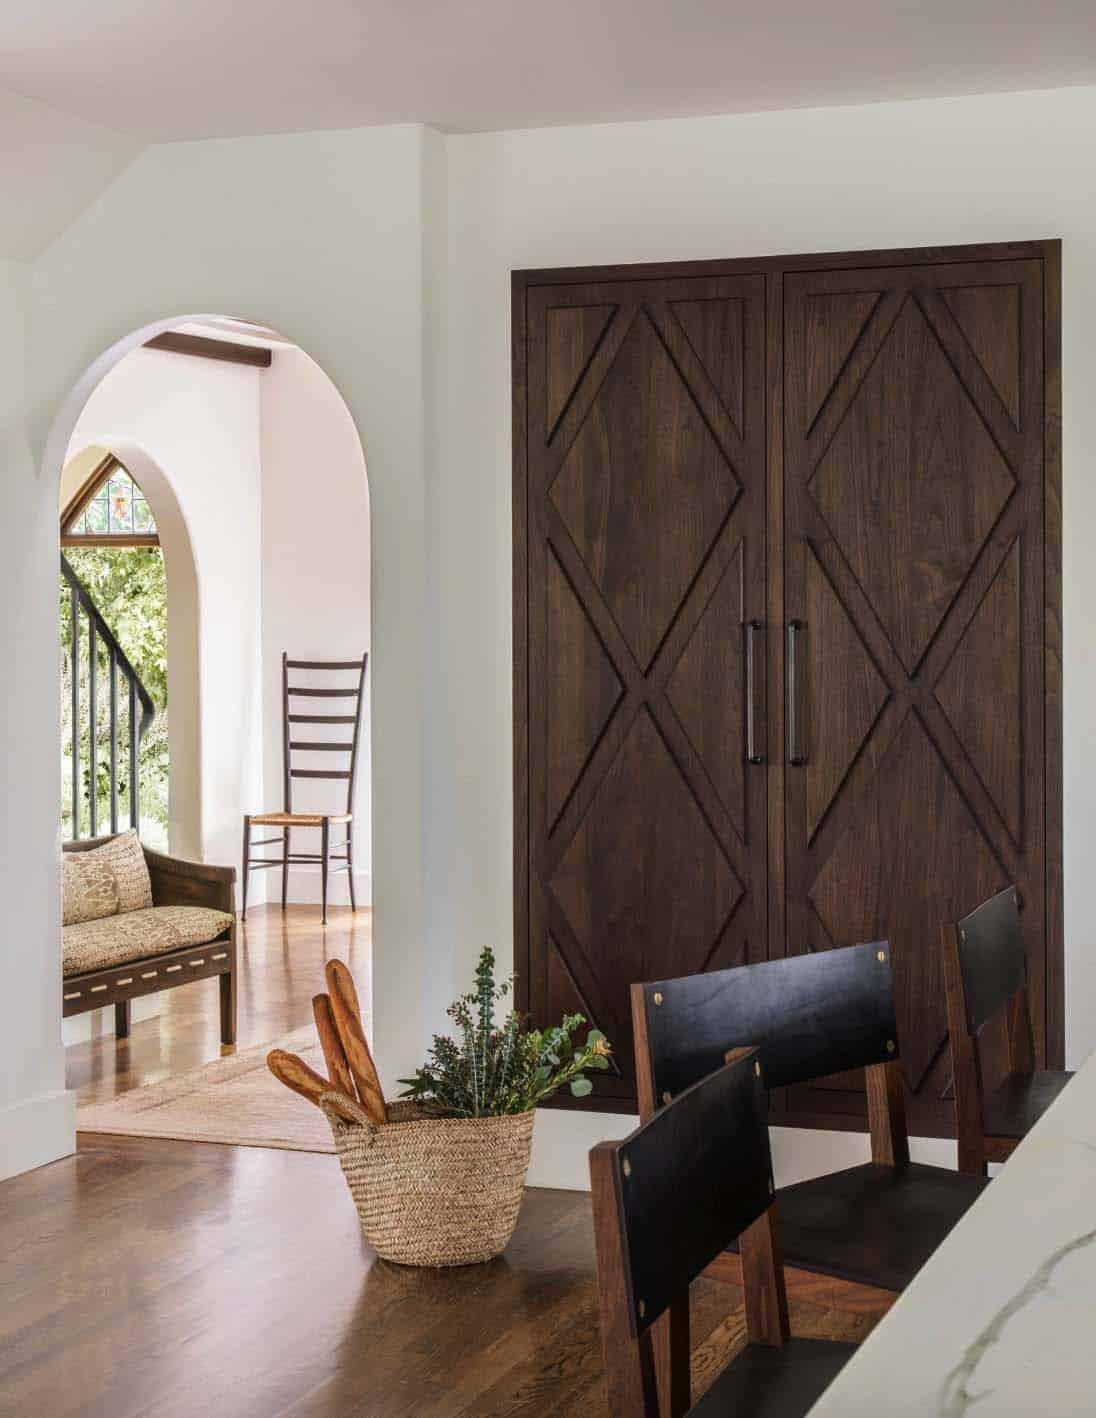 Mediterranean Style Home-Jute Interior Design-05-1 Kindesign